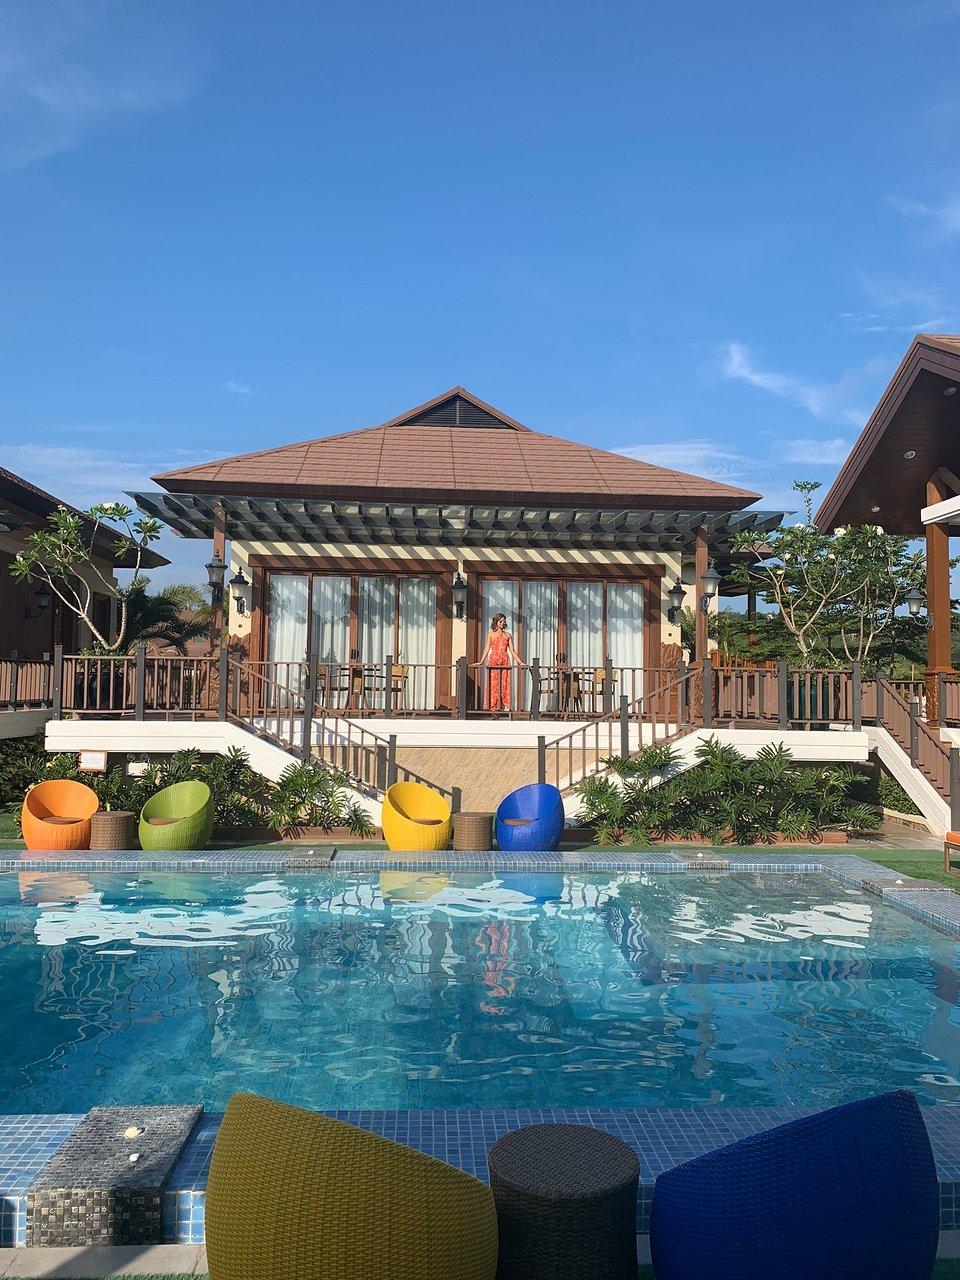 Pool Picture Of Highland Bali Villas Resort And Spa Luzon Tripadvisor